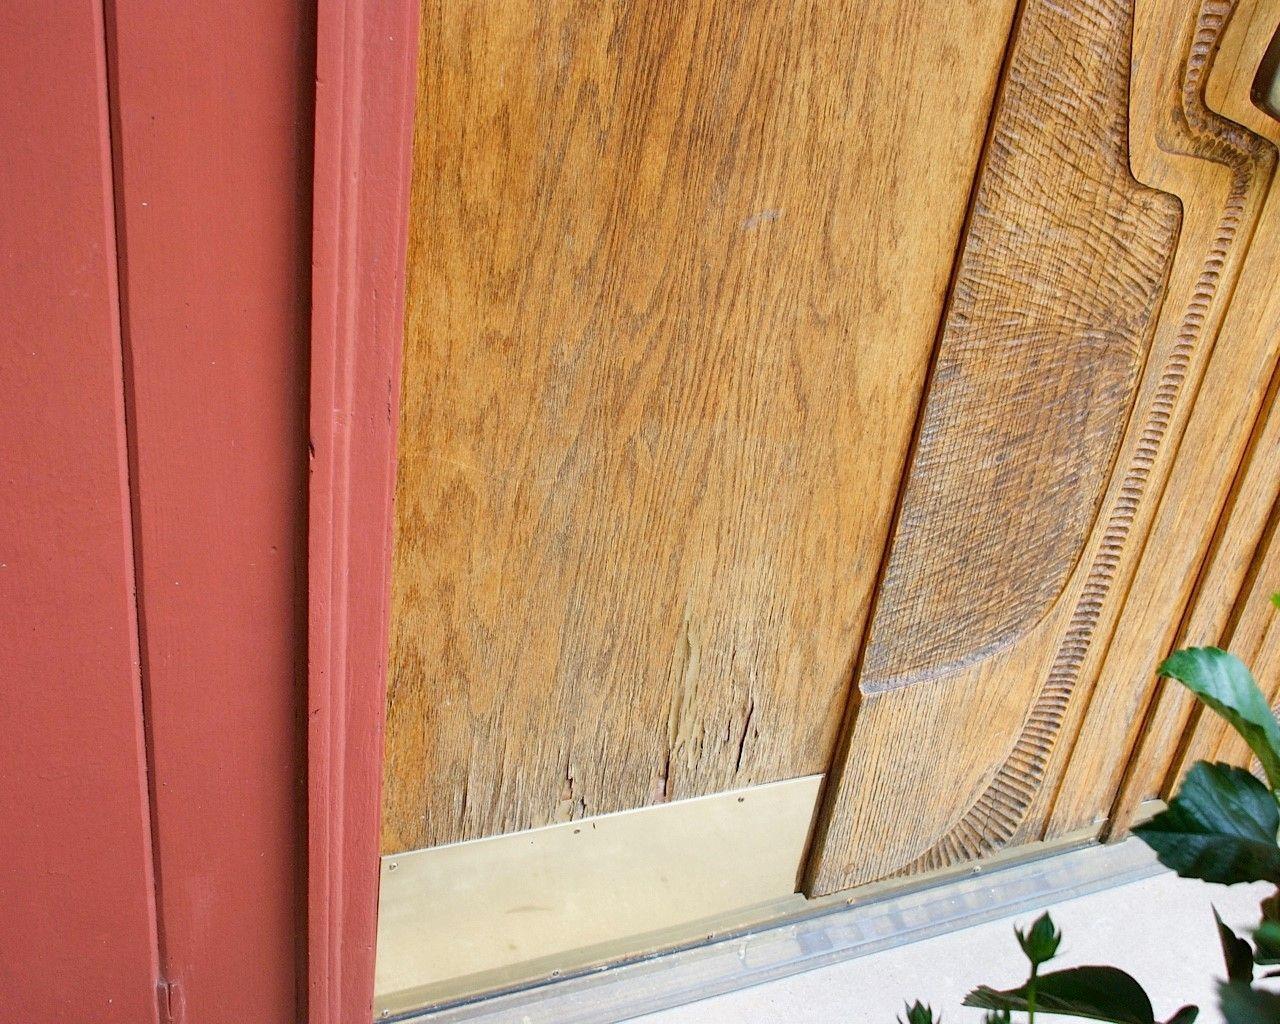 How To Repair Water Damaged Oak Veneer Wood Exterior Door